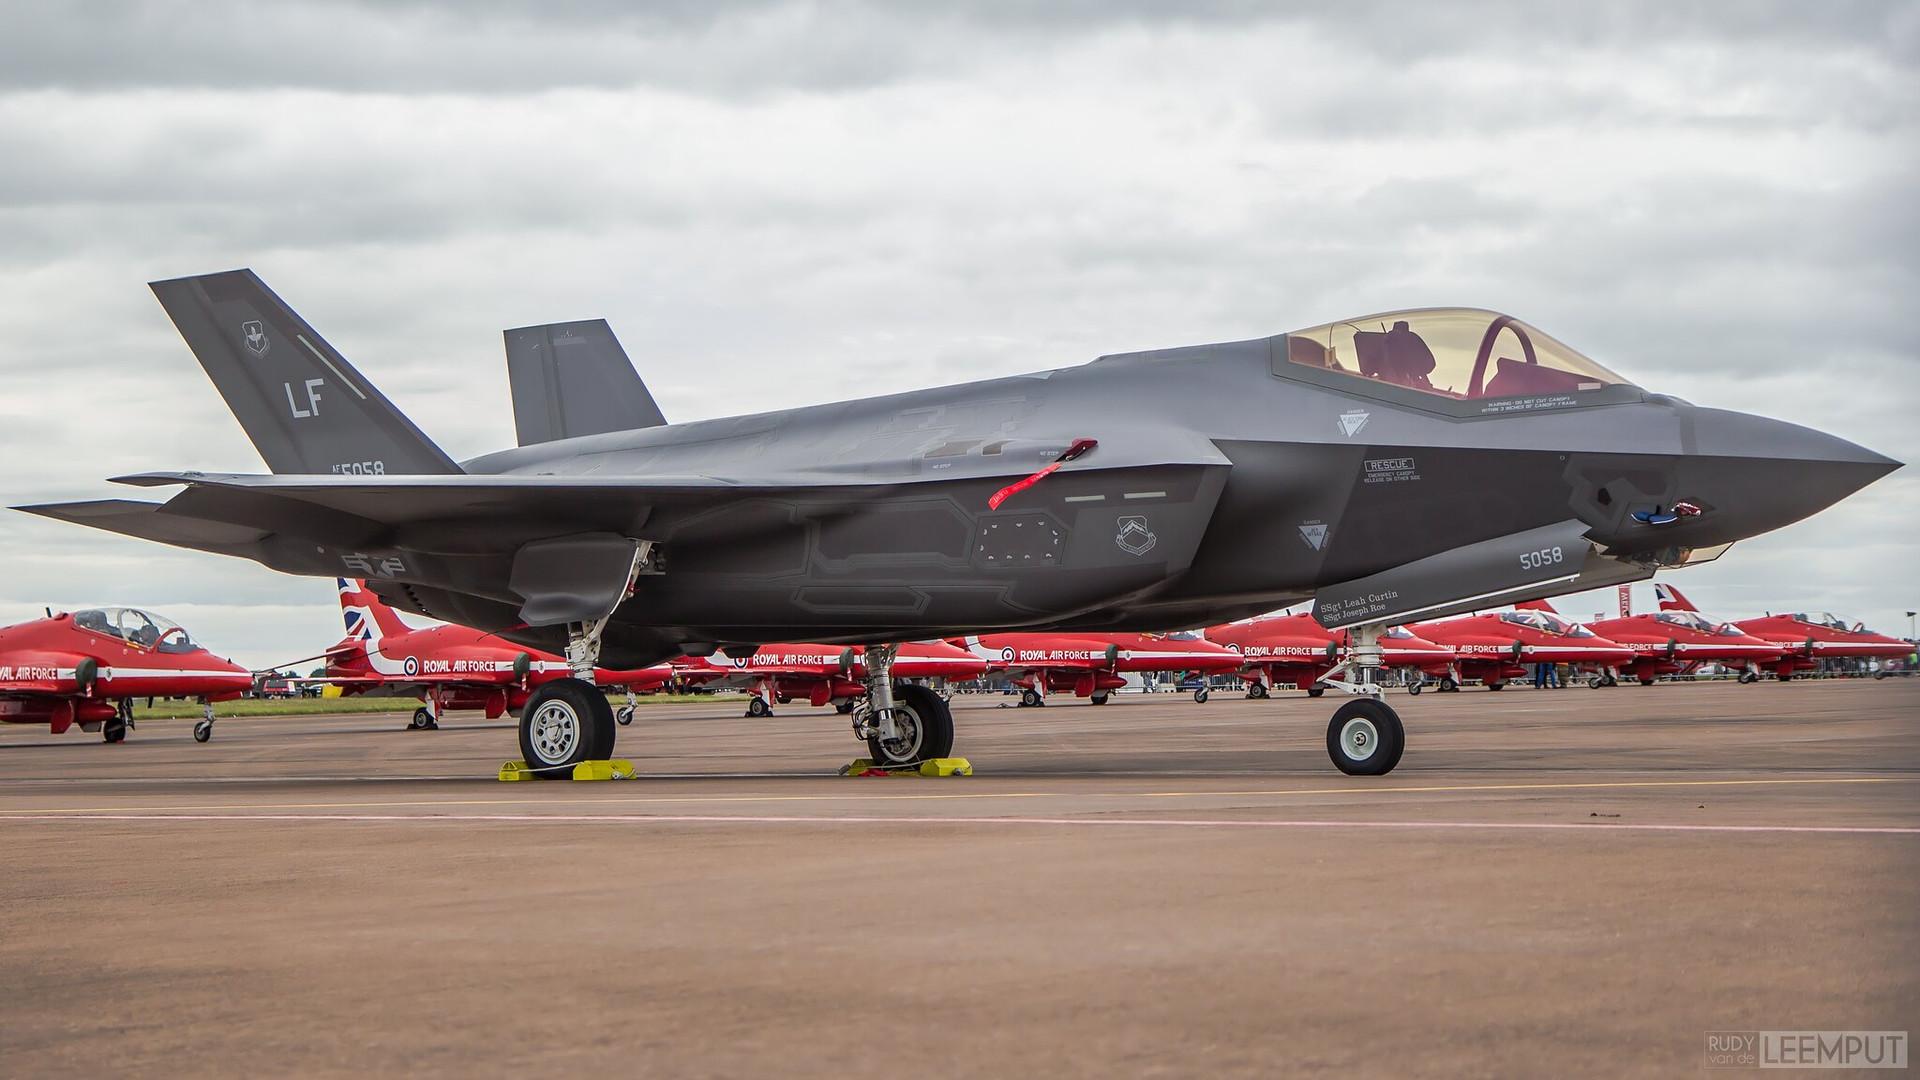 12-5058   Build: 2012 - Lockheed Martin F-35A Lightning II